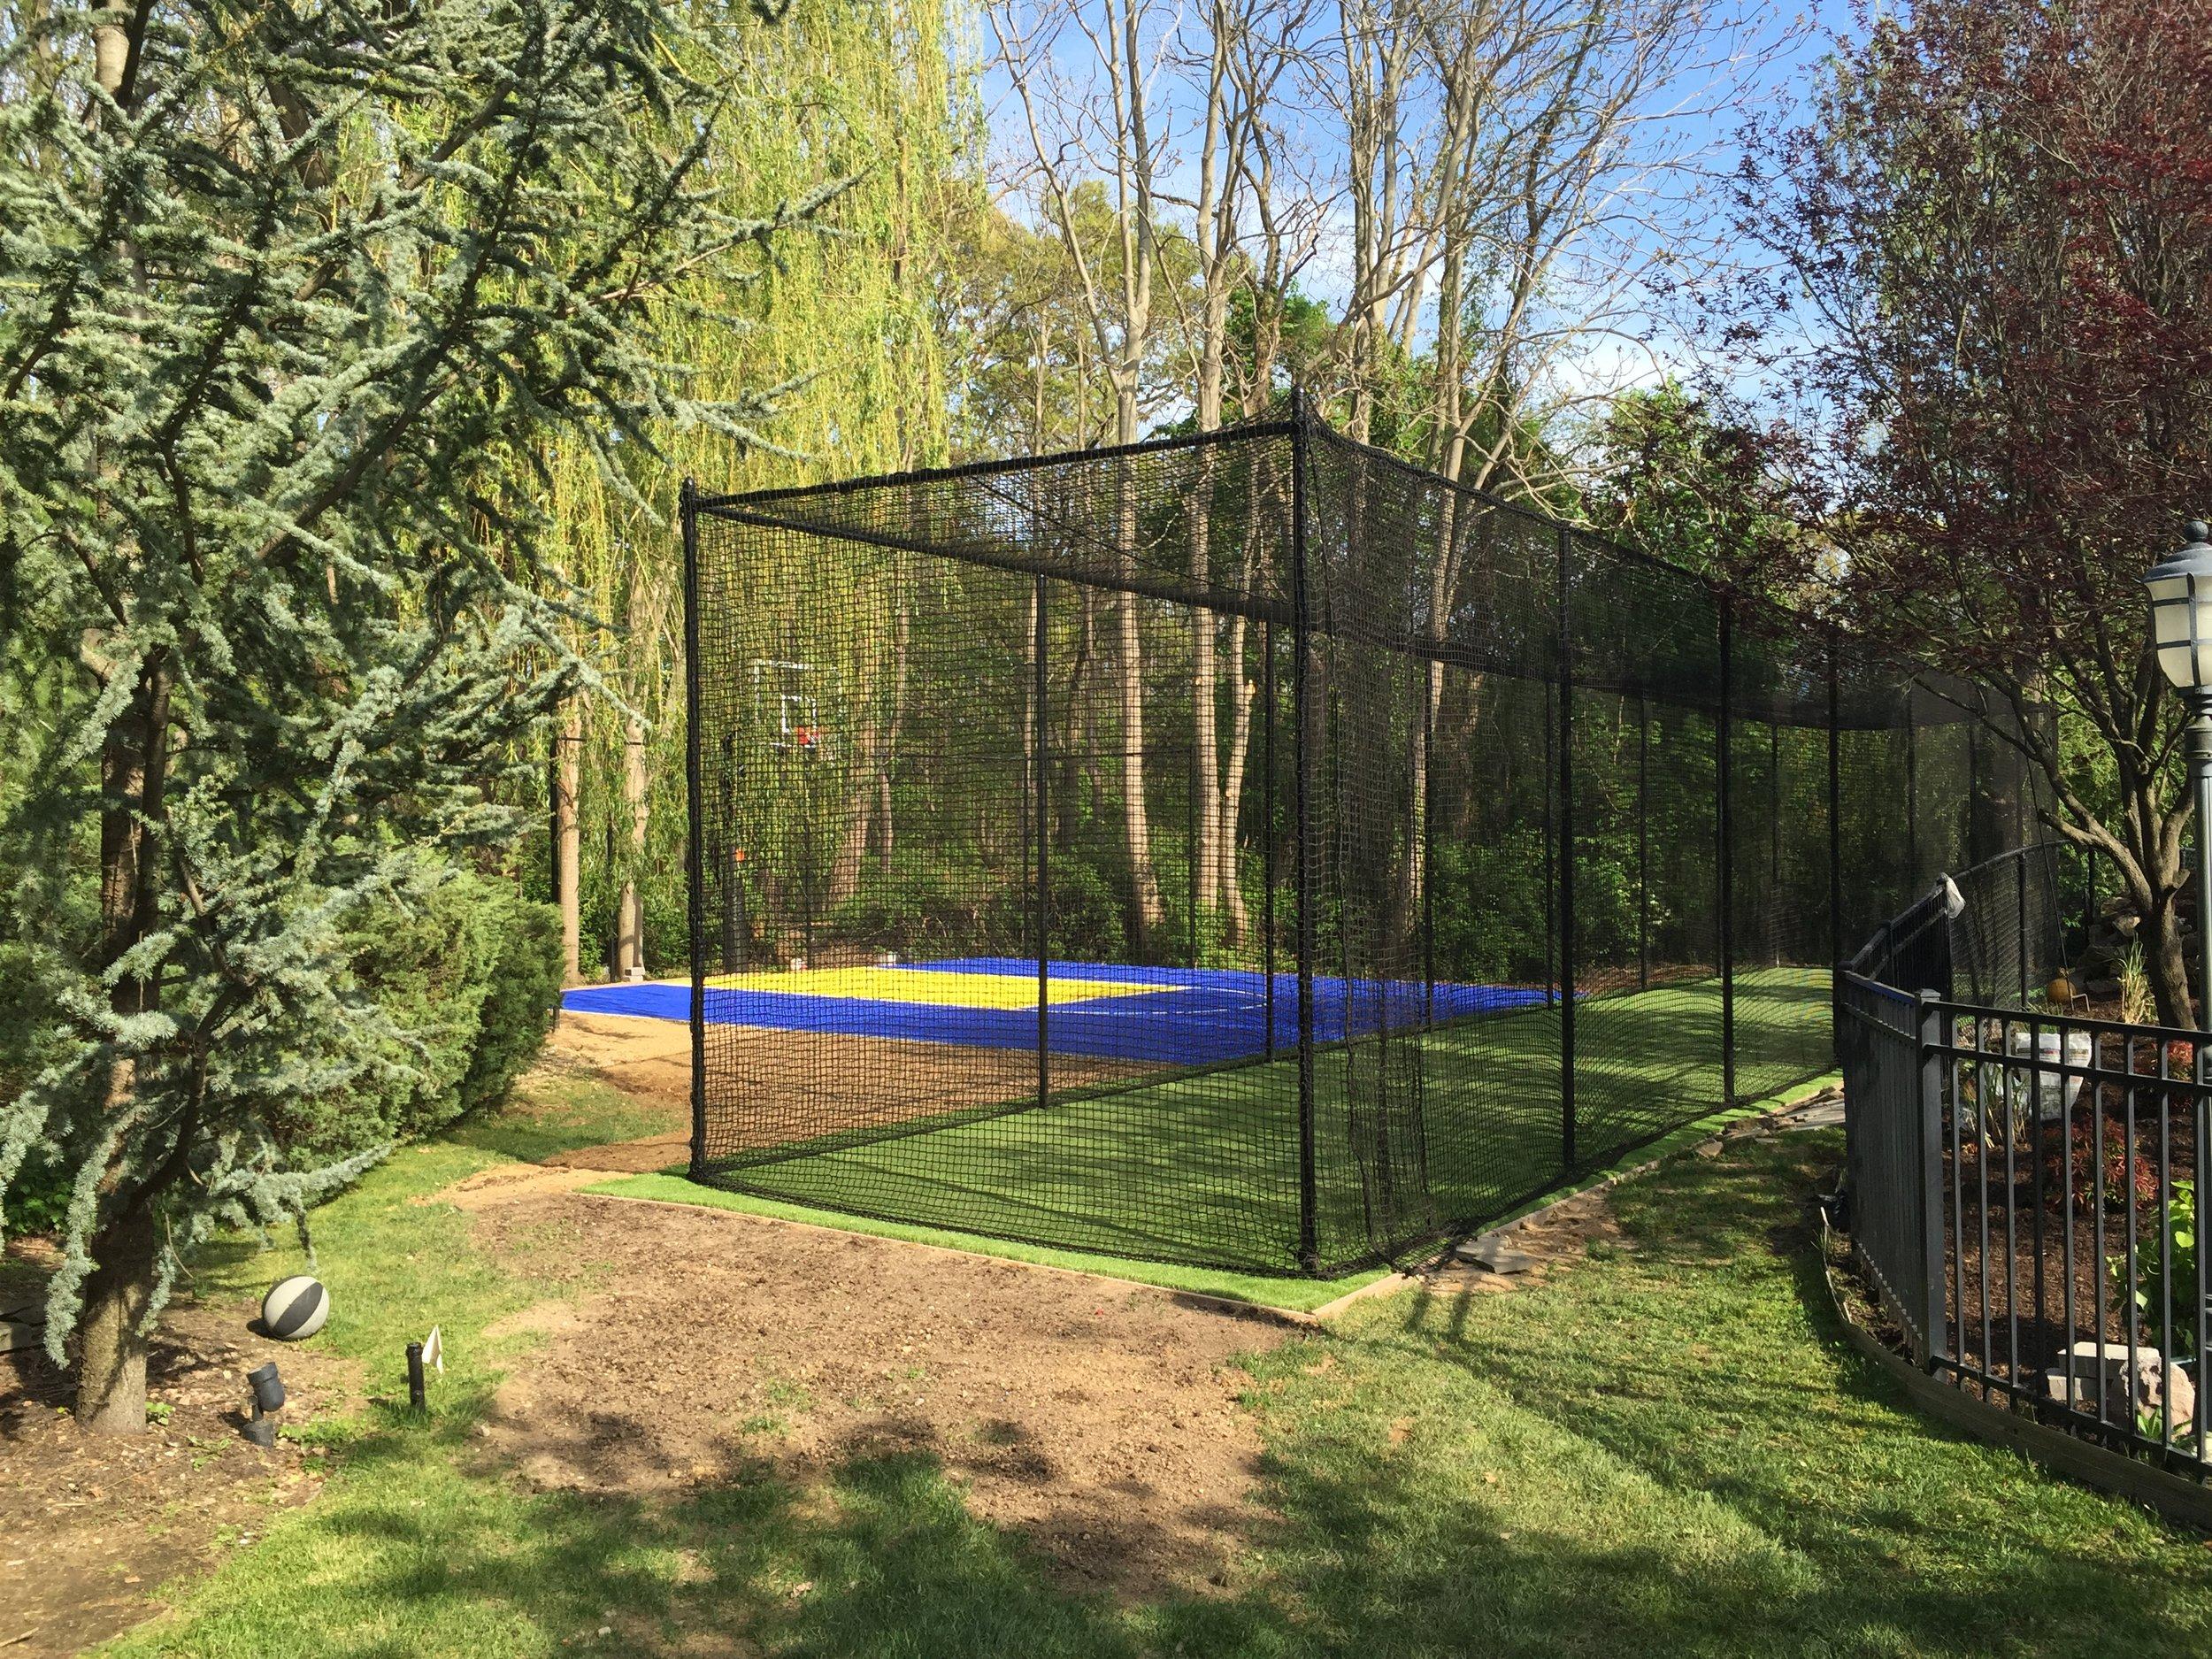 Professional turf installation design company in Long Island, NY